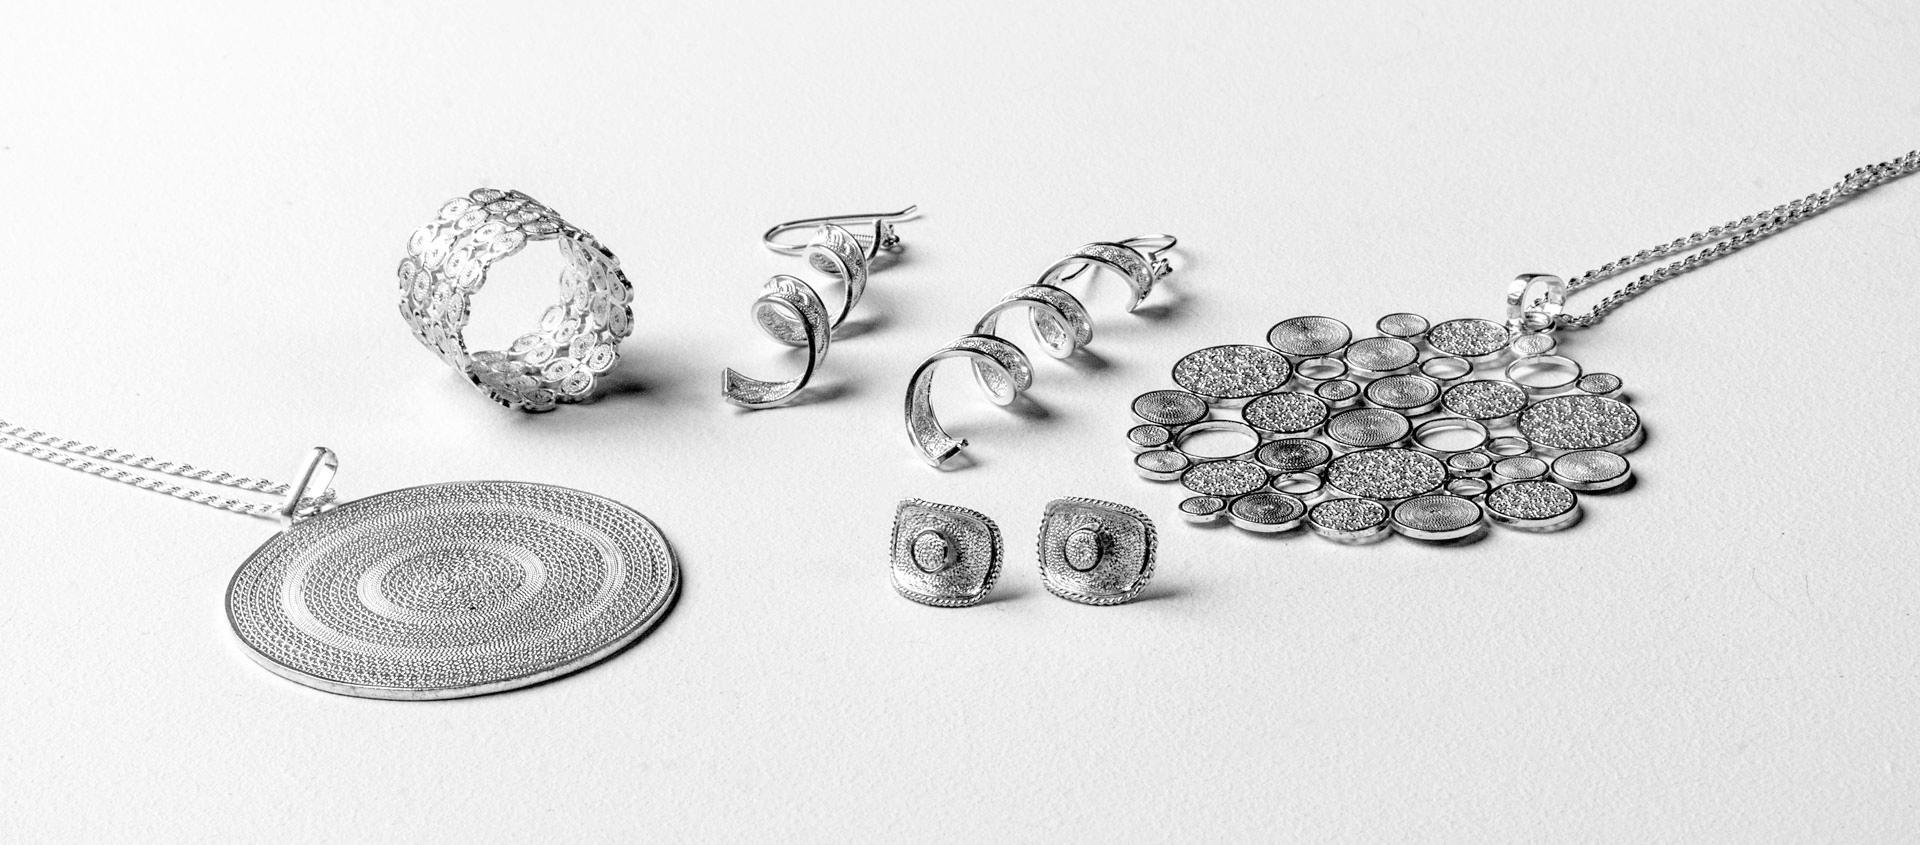 Silver Handmade Jewelry